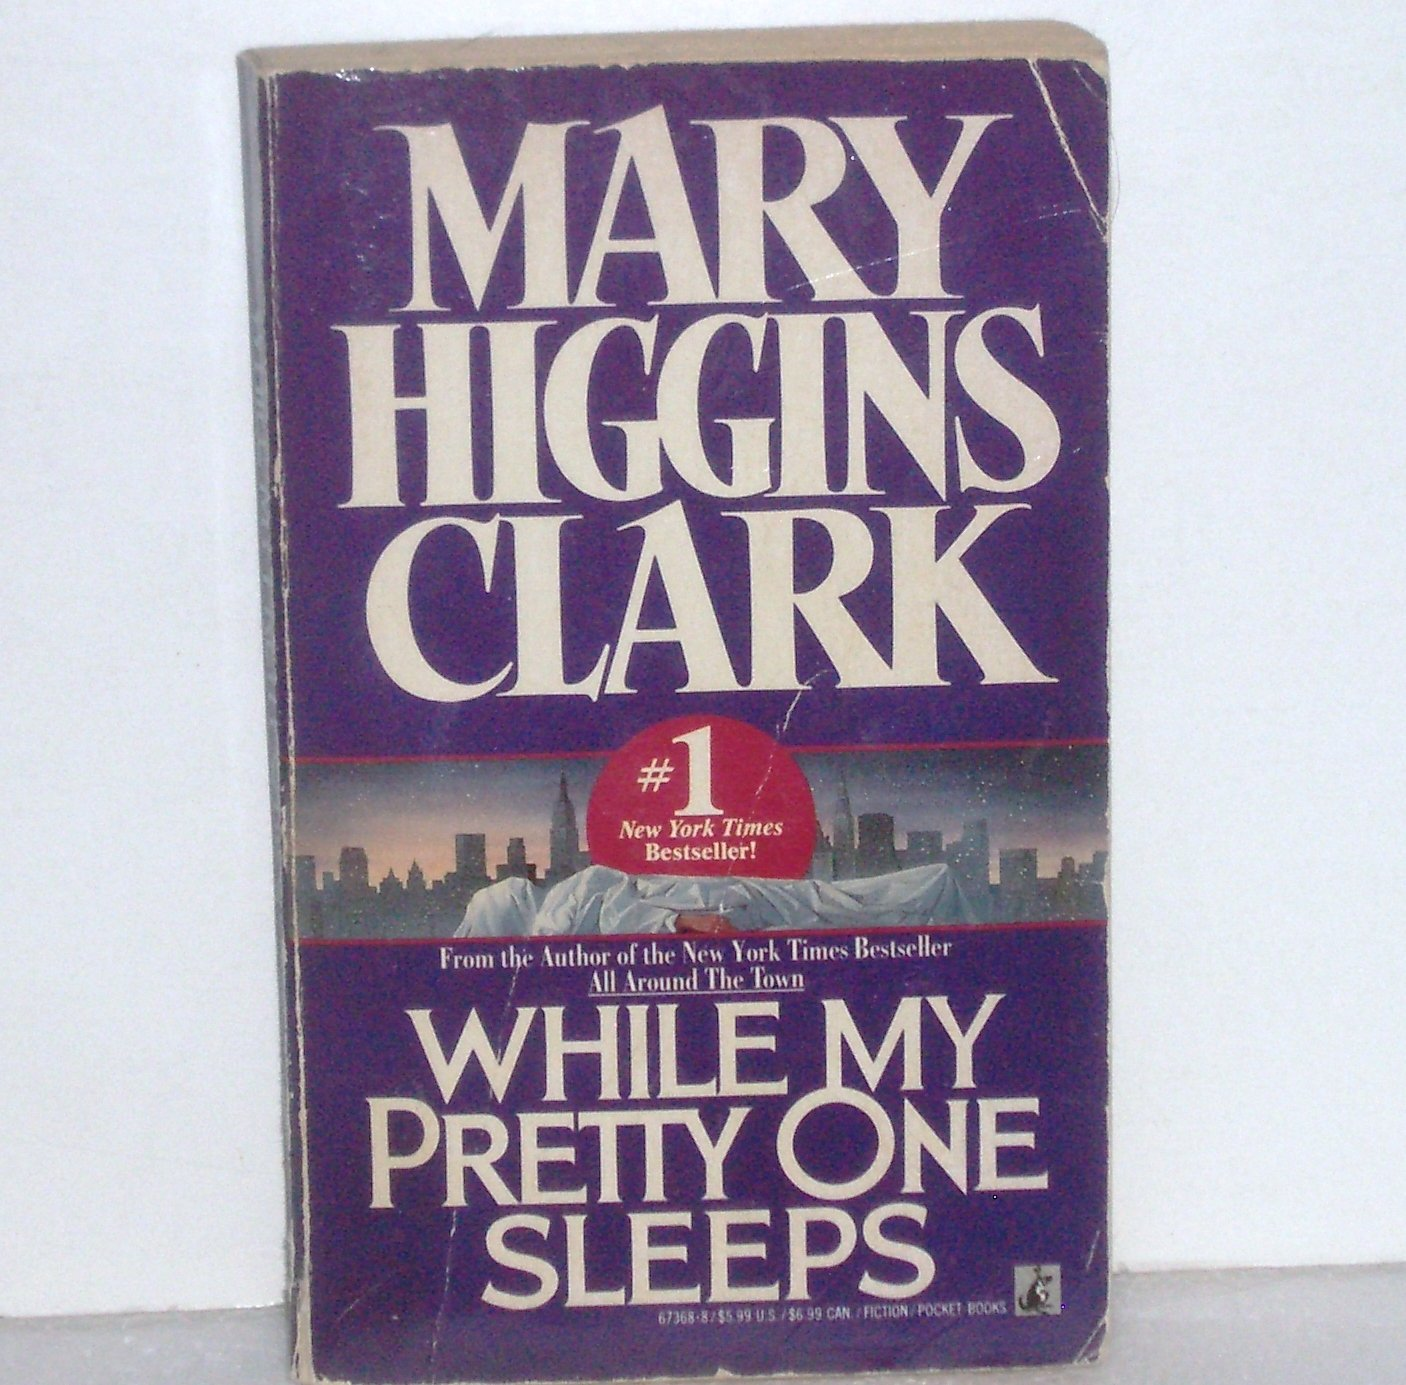 While My Pretty One Sleeps by Mary Higgins Clark Suspense Thriller 1990